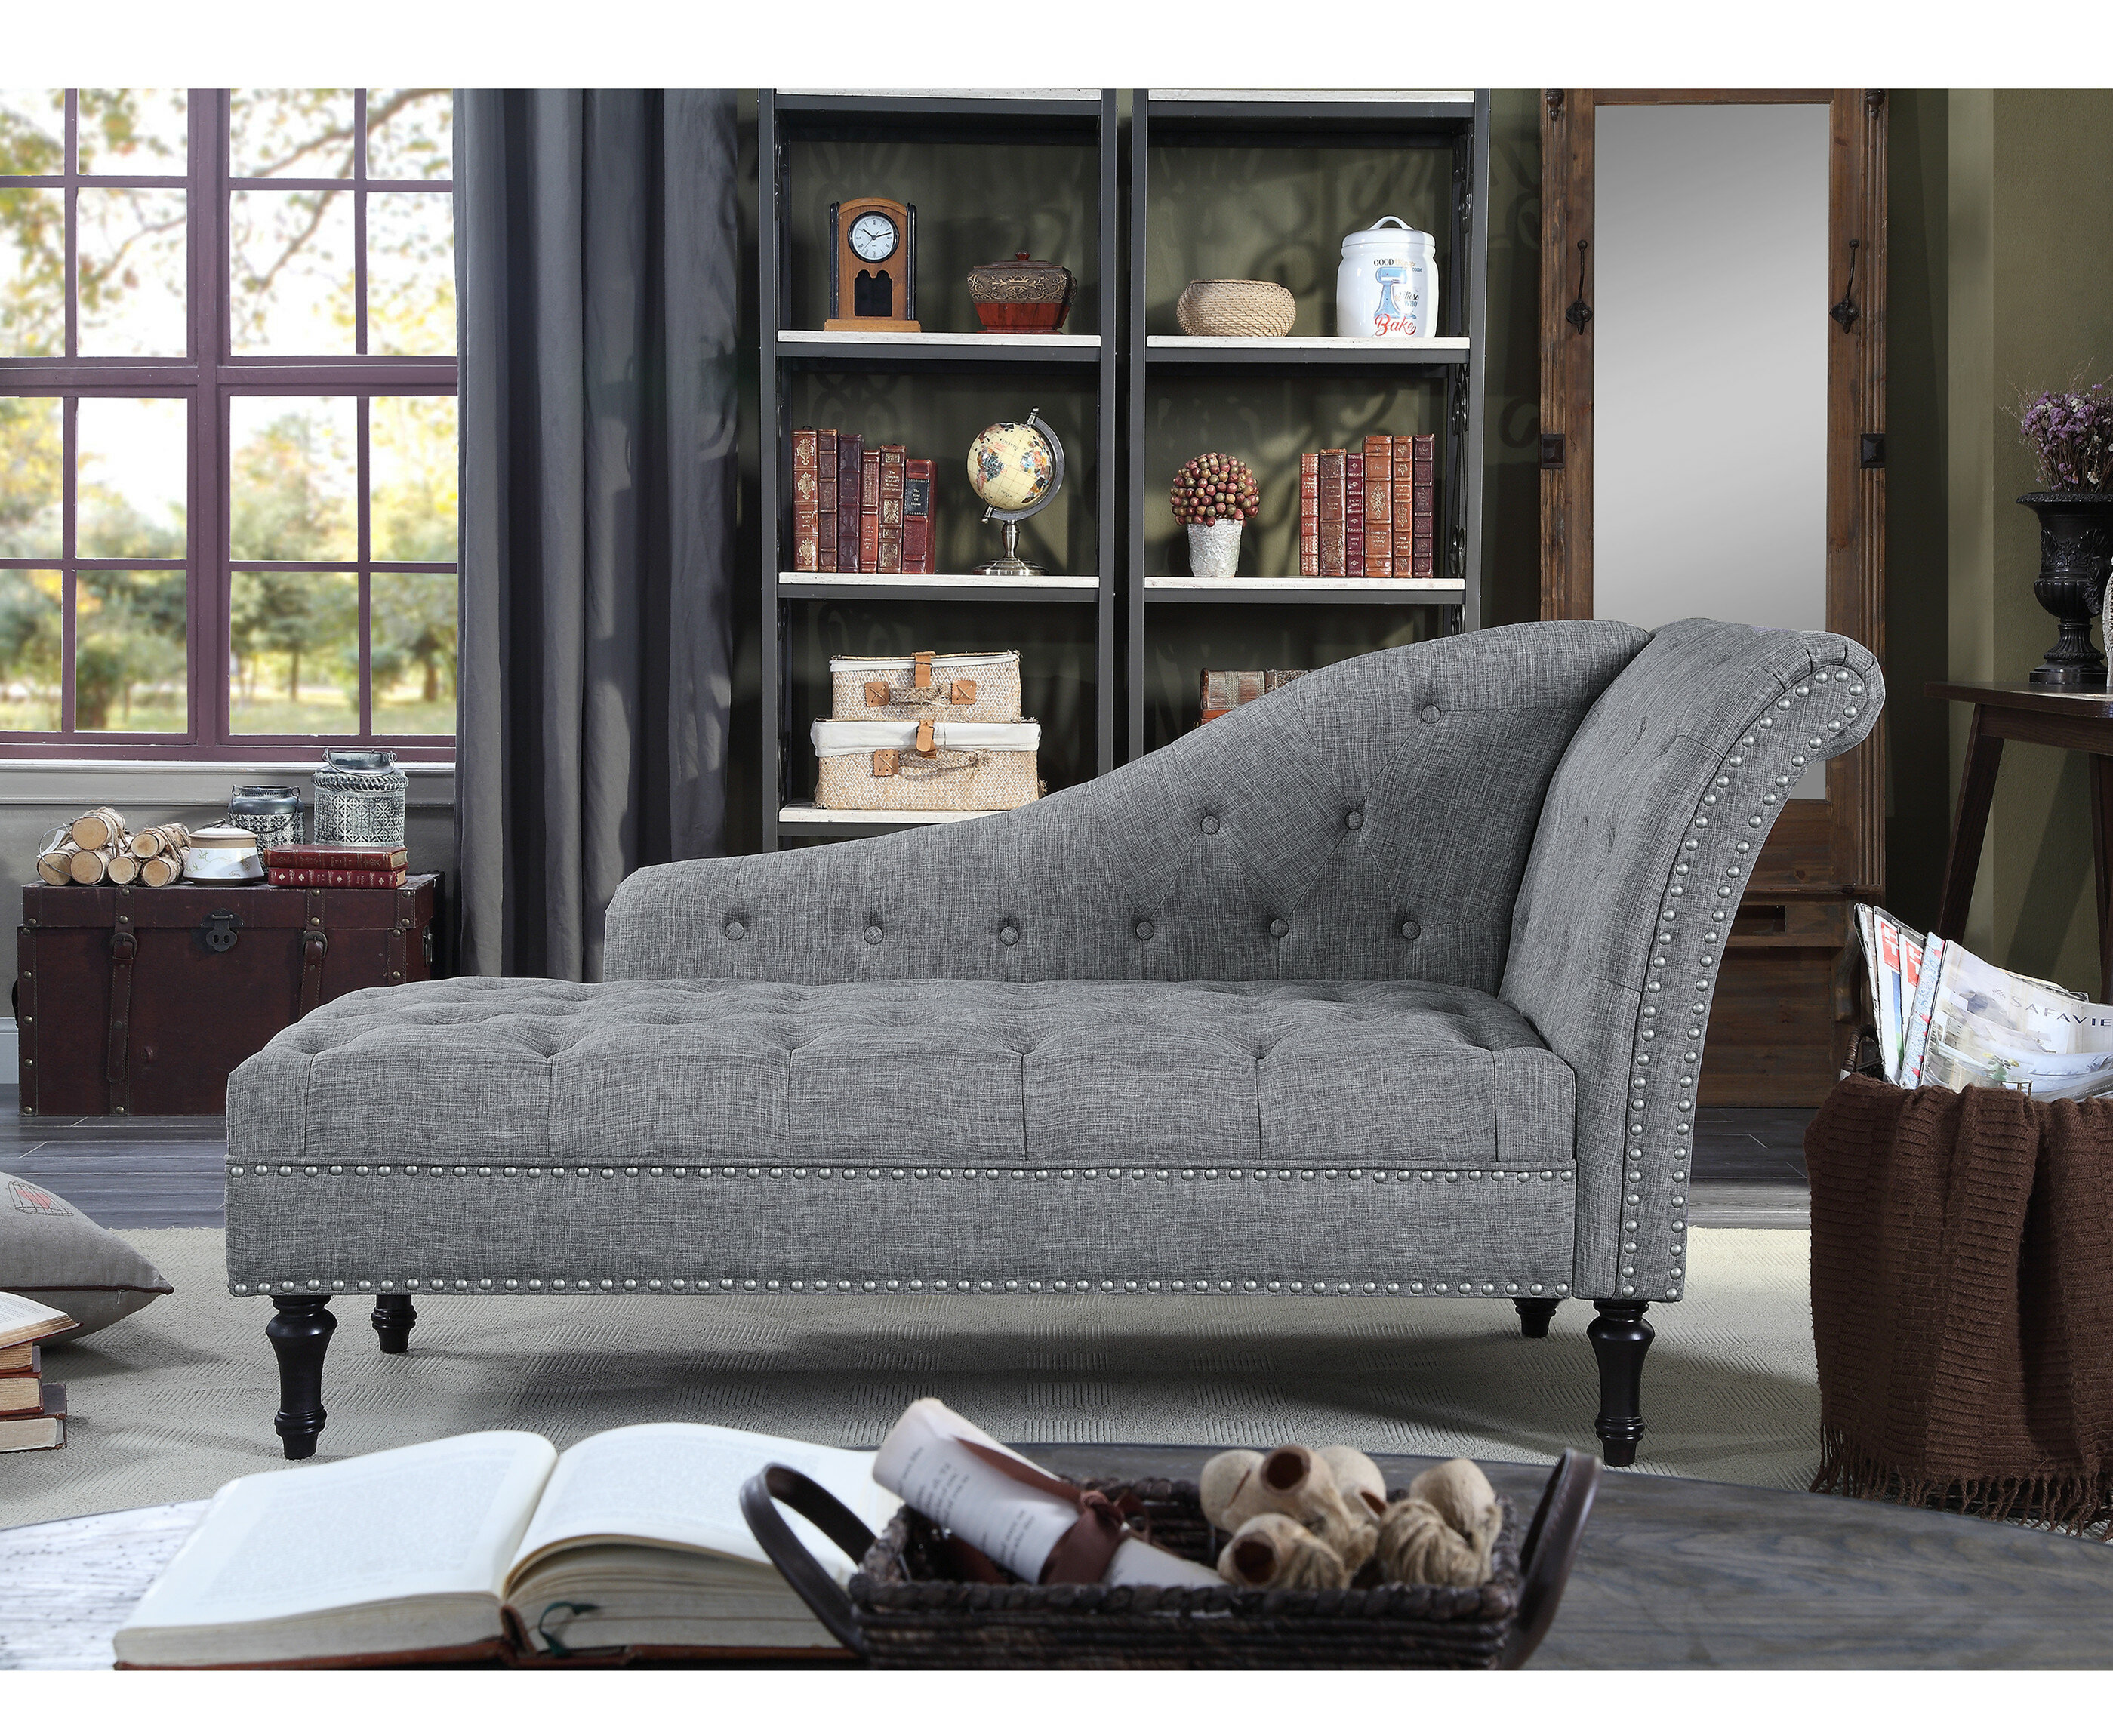 - Darby Home Co Deedee Chaise Lounge & Reviews Wayfair